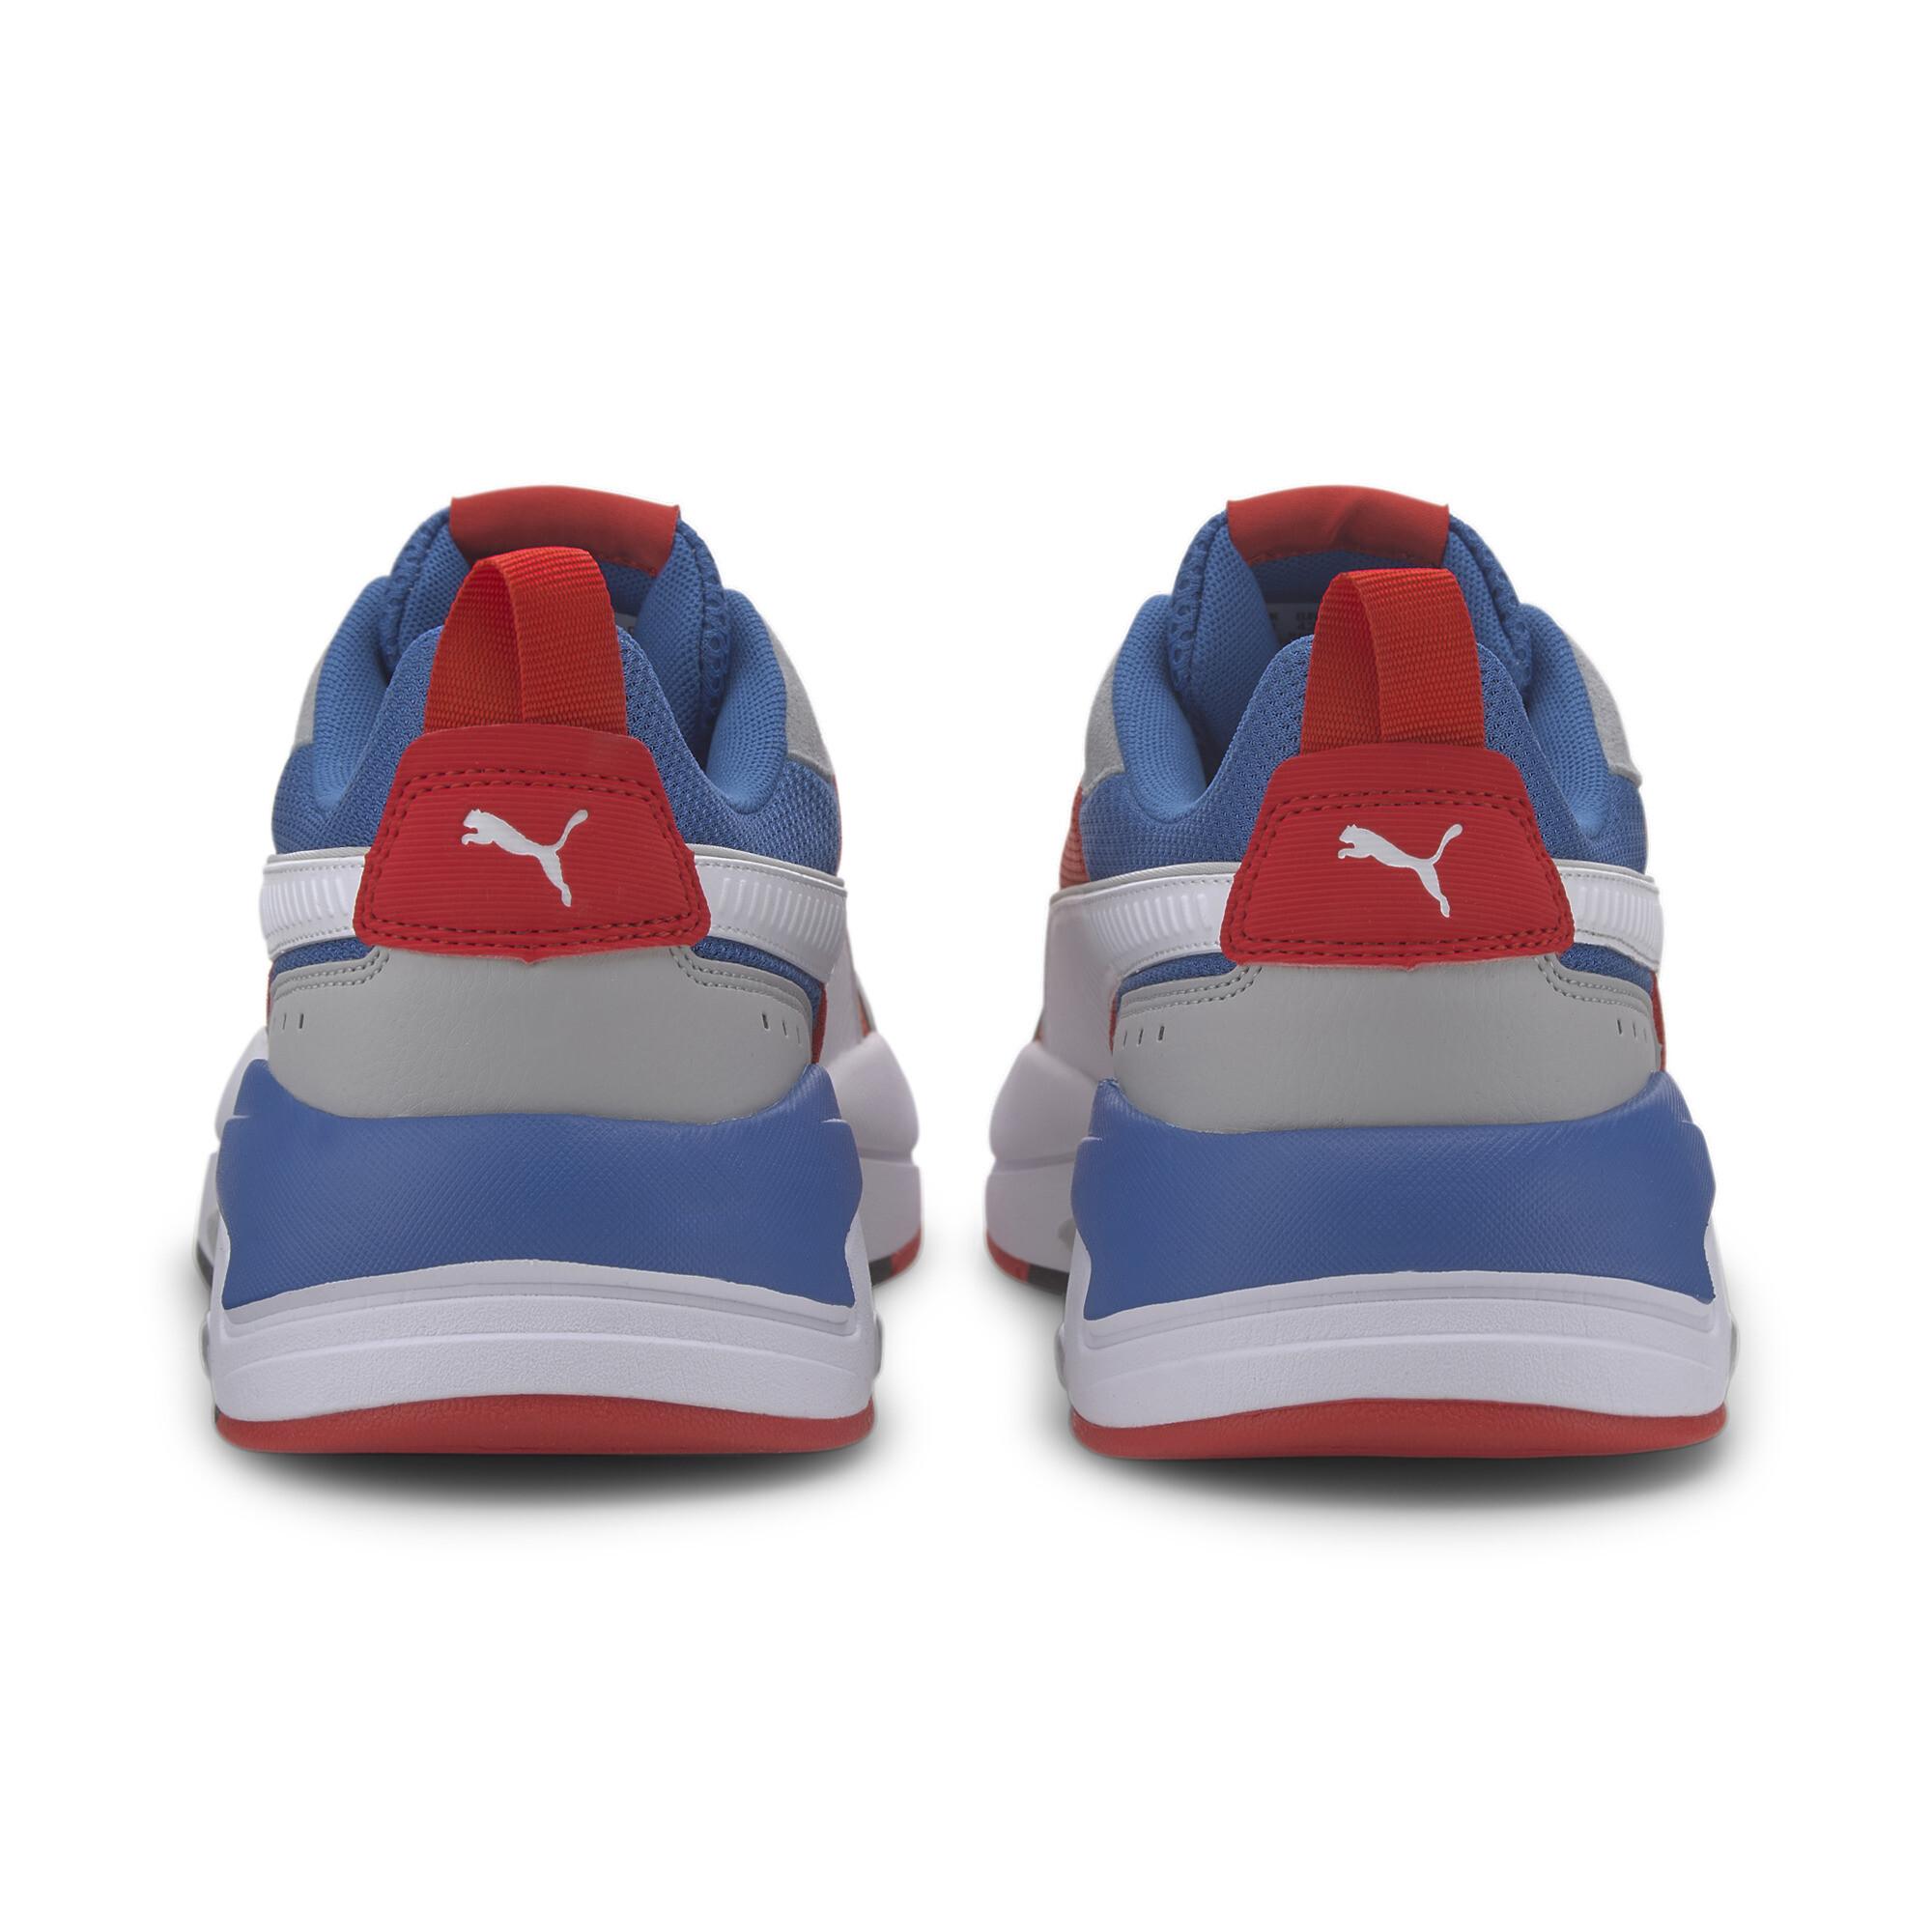 PUMA-Men-039-s-X-RAY-Sneakers thumbnail 10